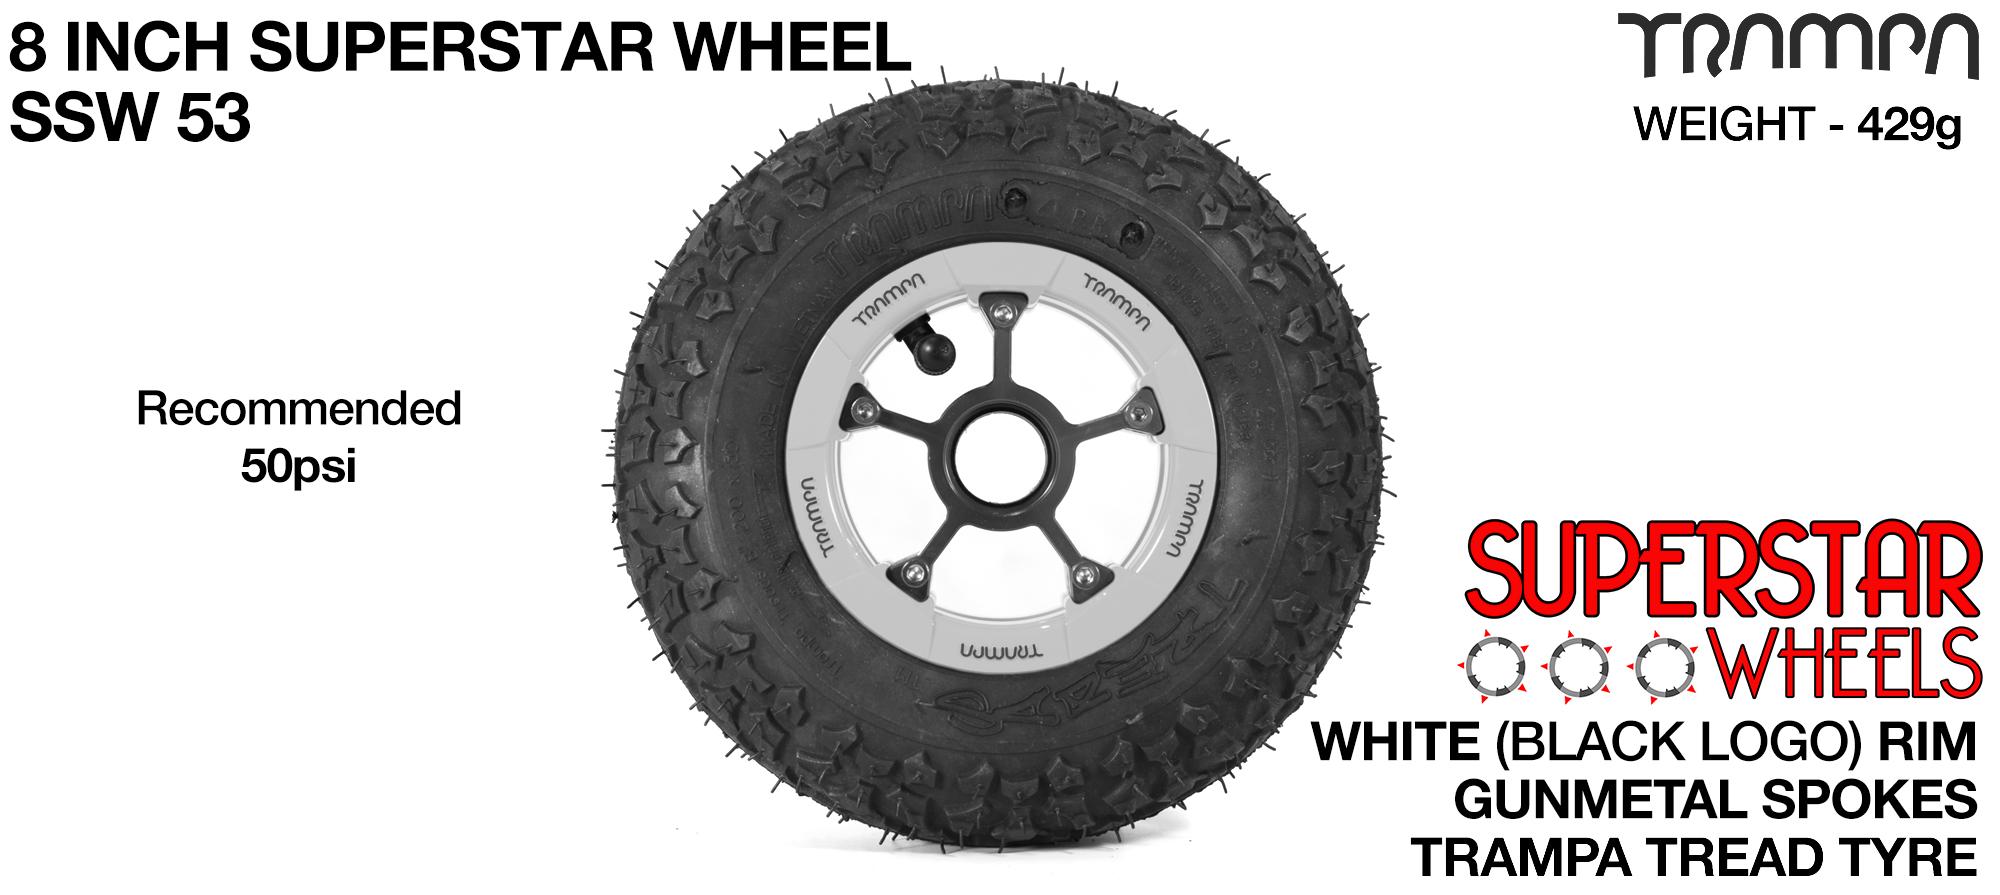 Superstar 8 inch wheel - White Gloss Rim Gunmetal Anodised spokes & TRAMPA TREAD 8 Inch Tyres